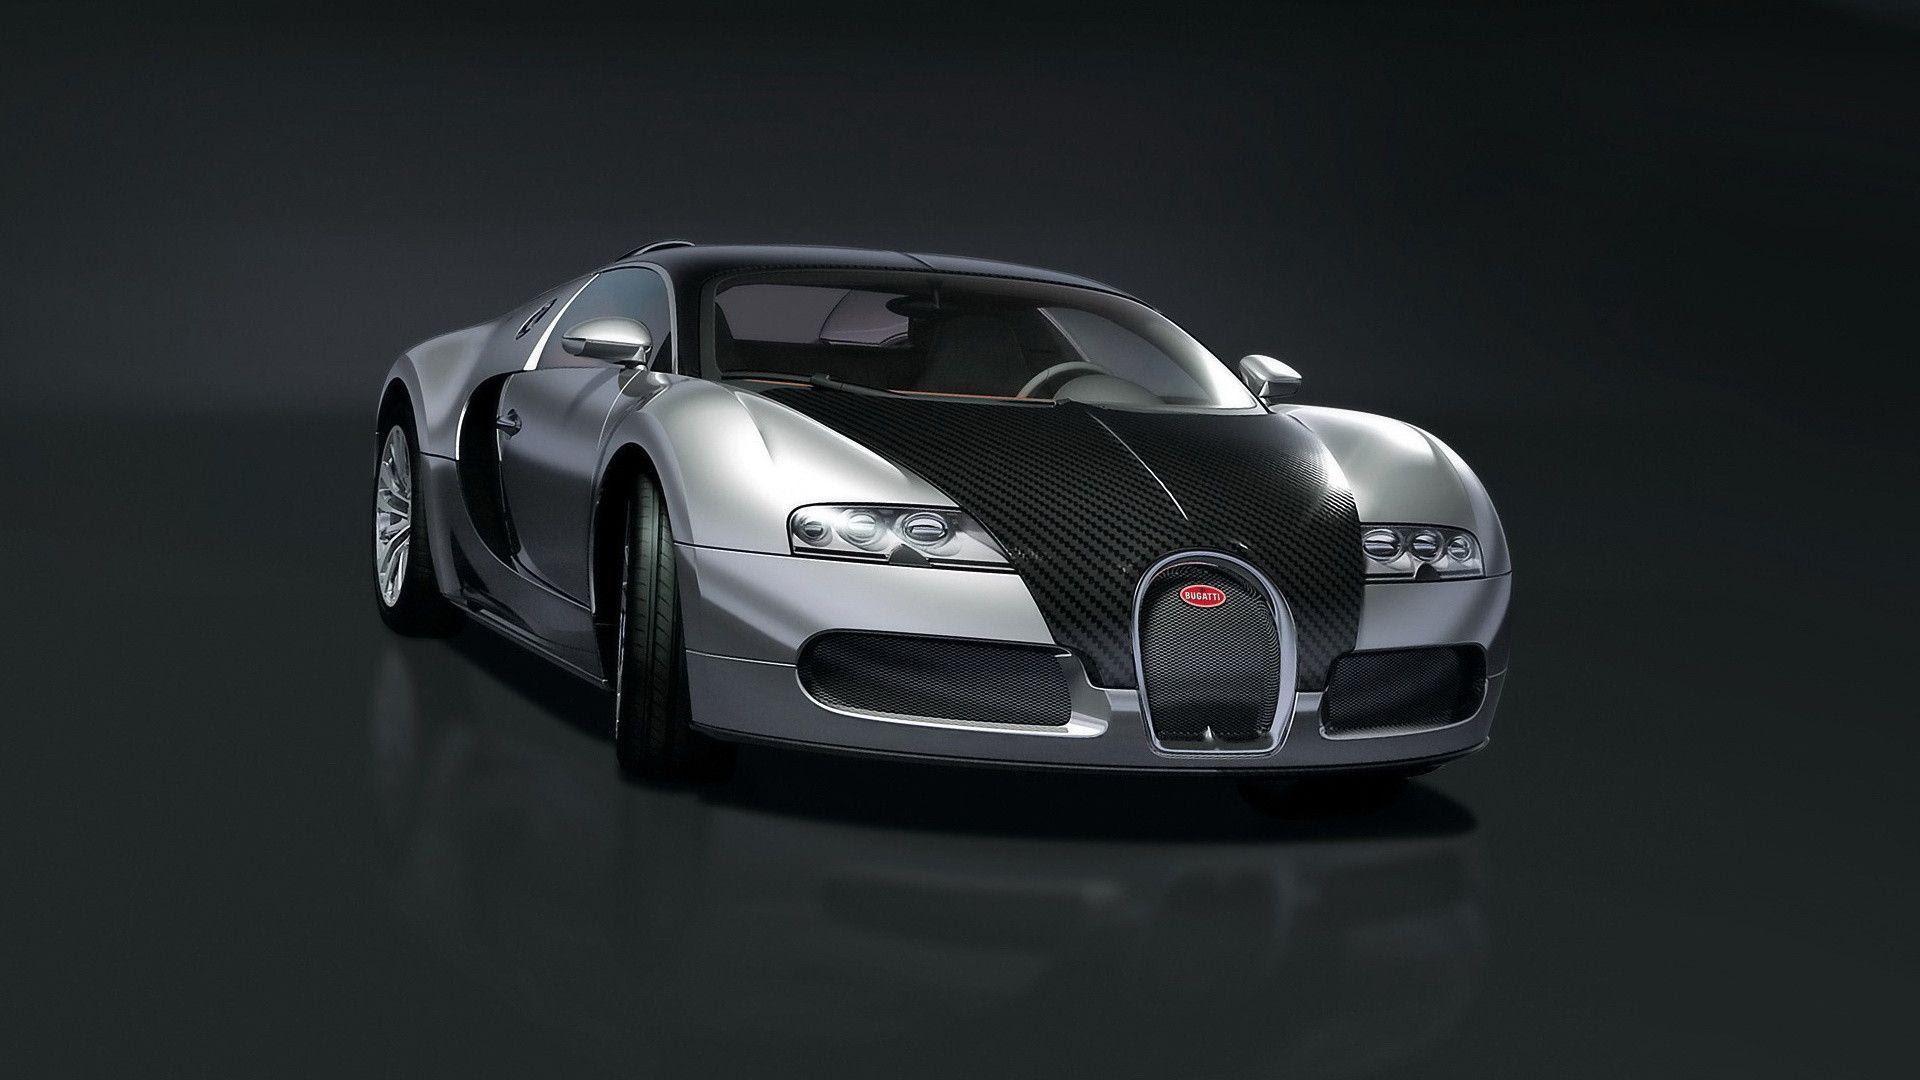 Bugatti Veyron HD Wallpapers  Wallpaper Cave